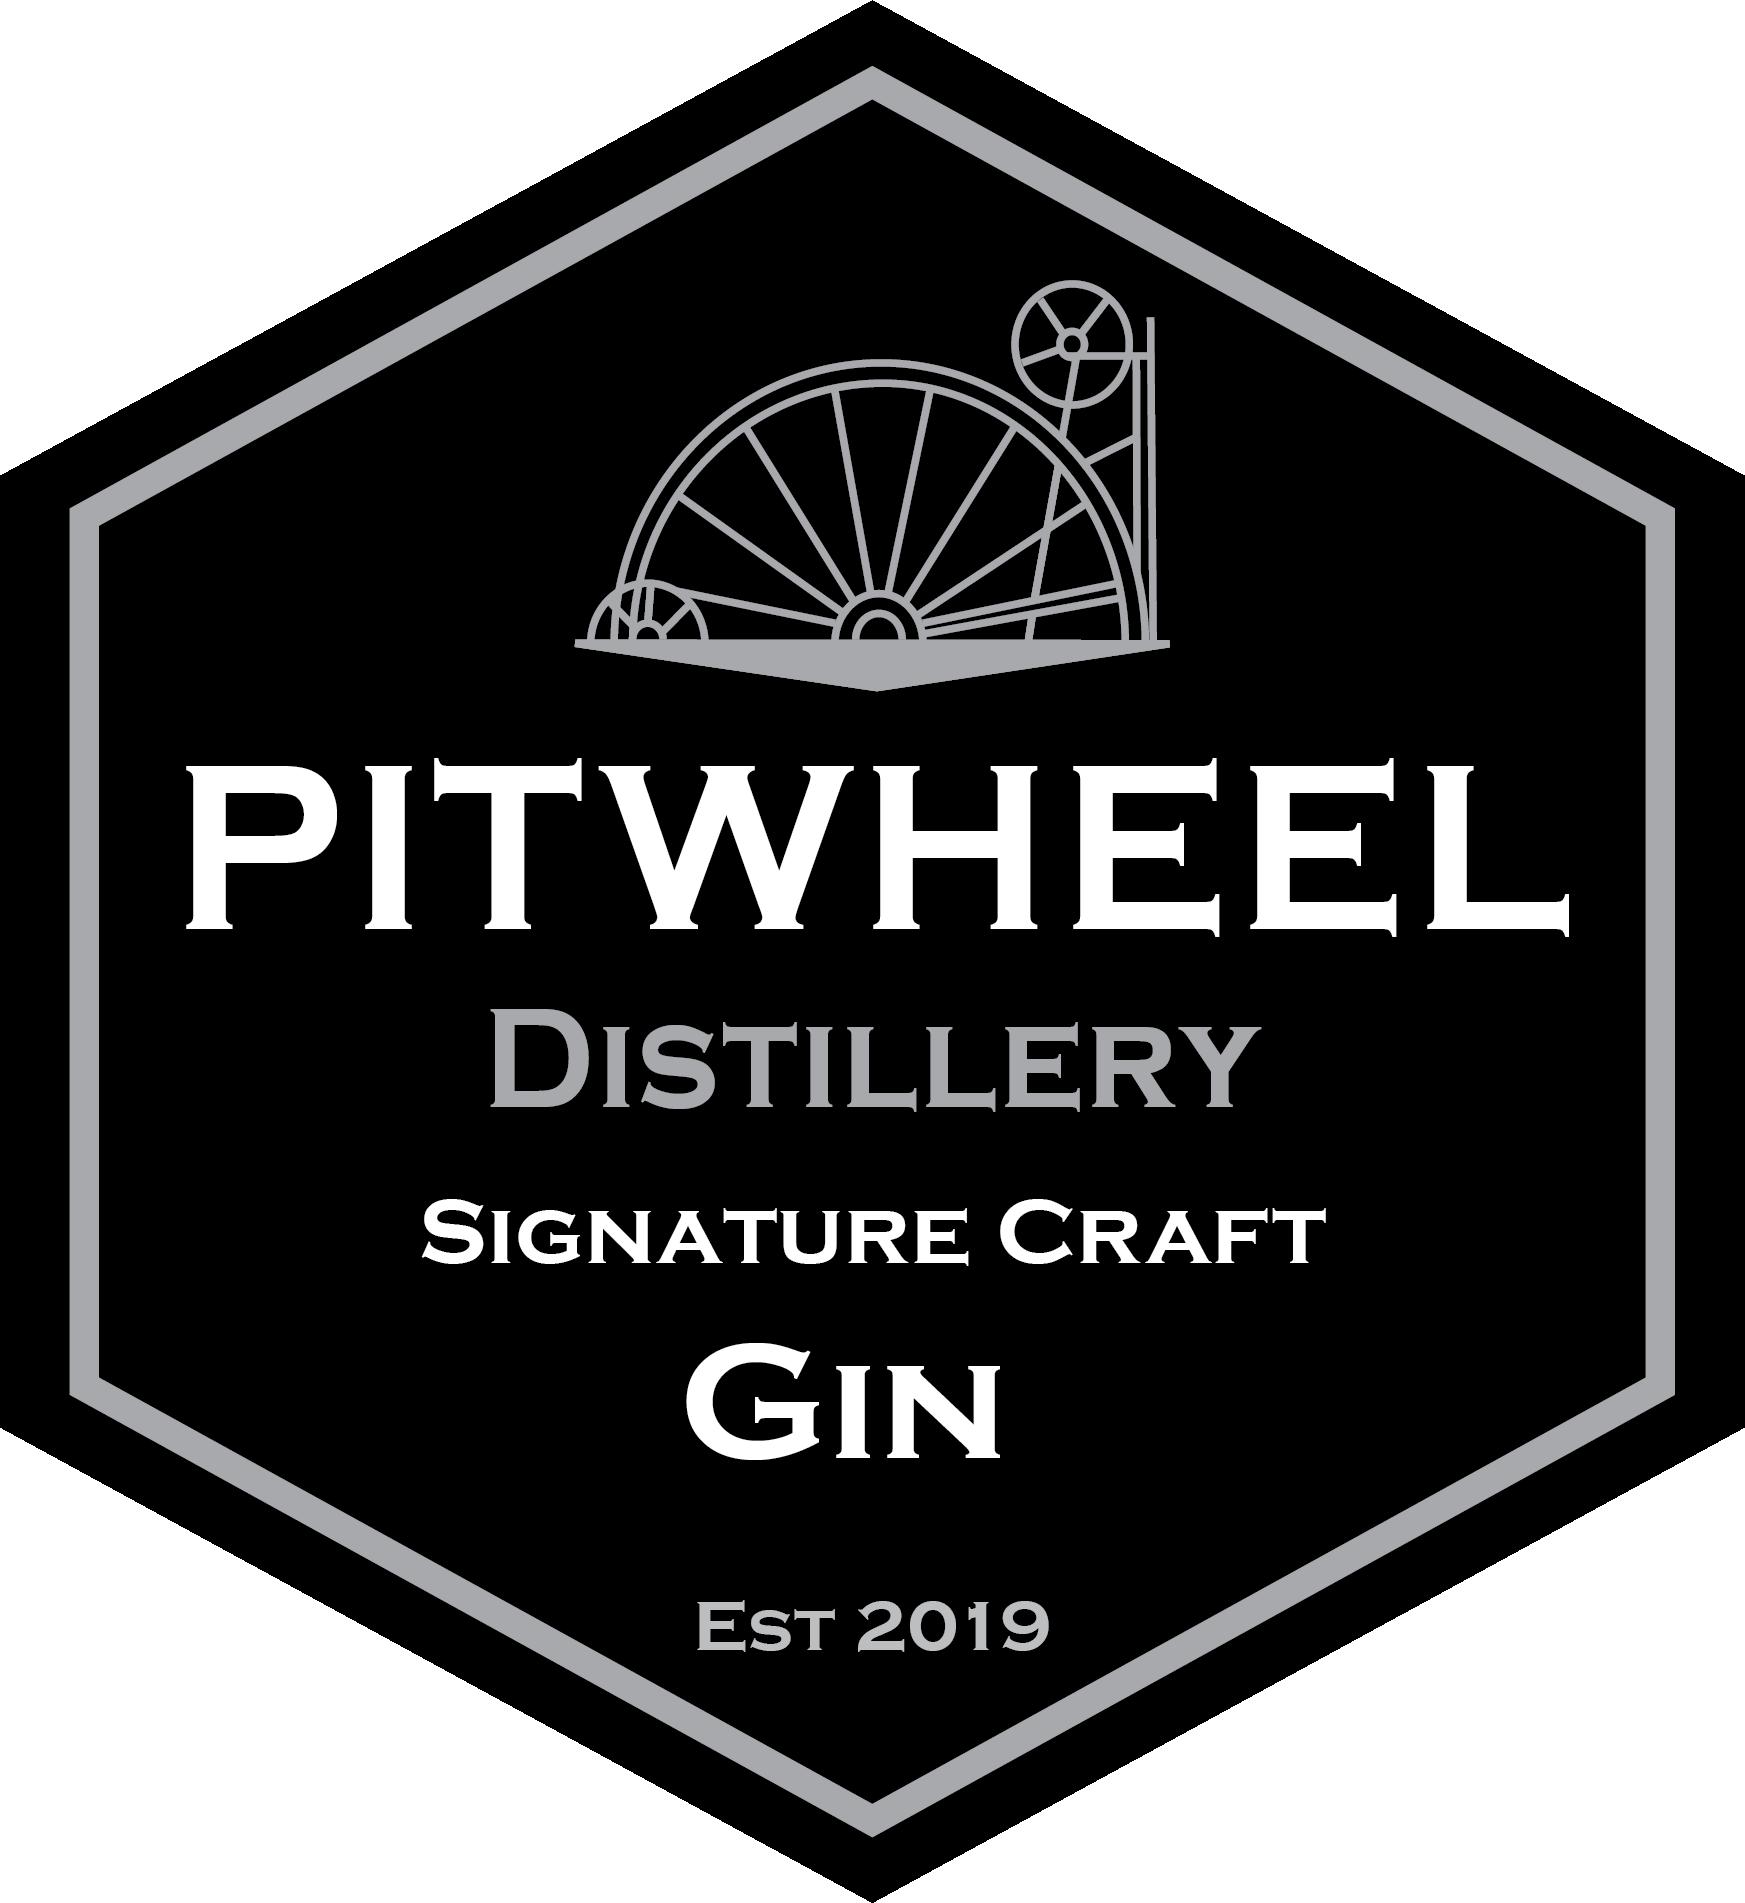 PitWheel Distillery Ltd